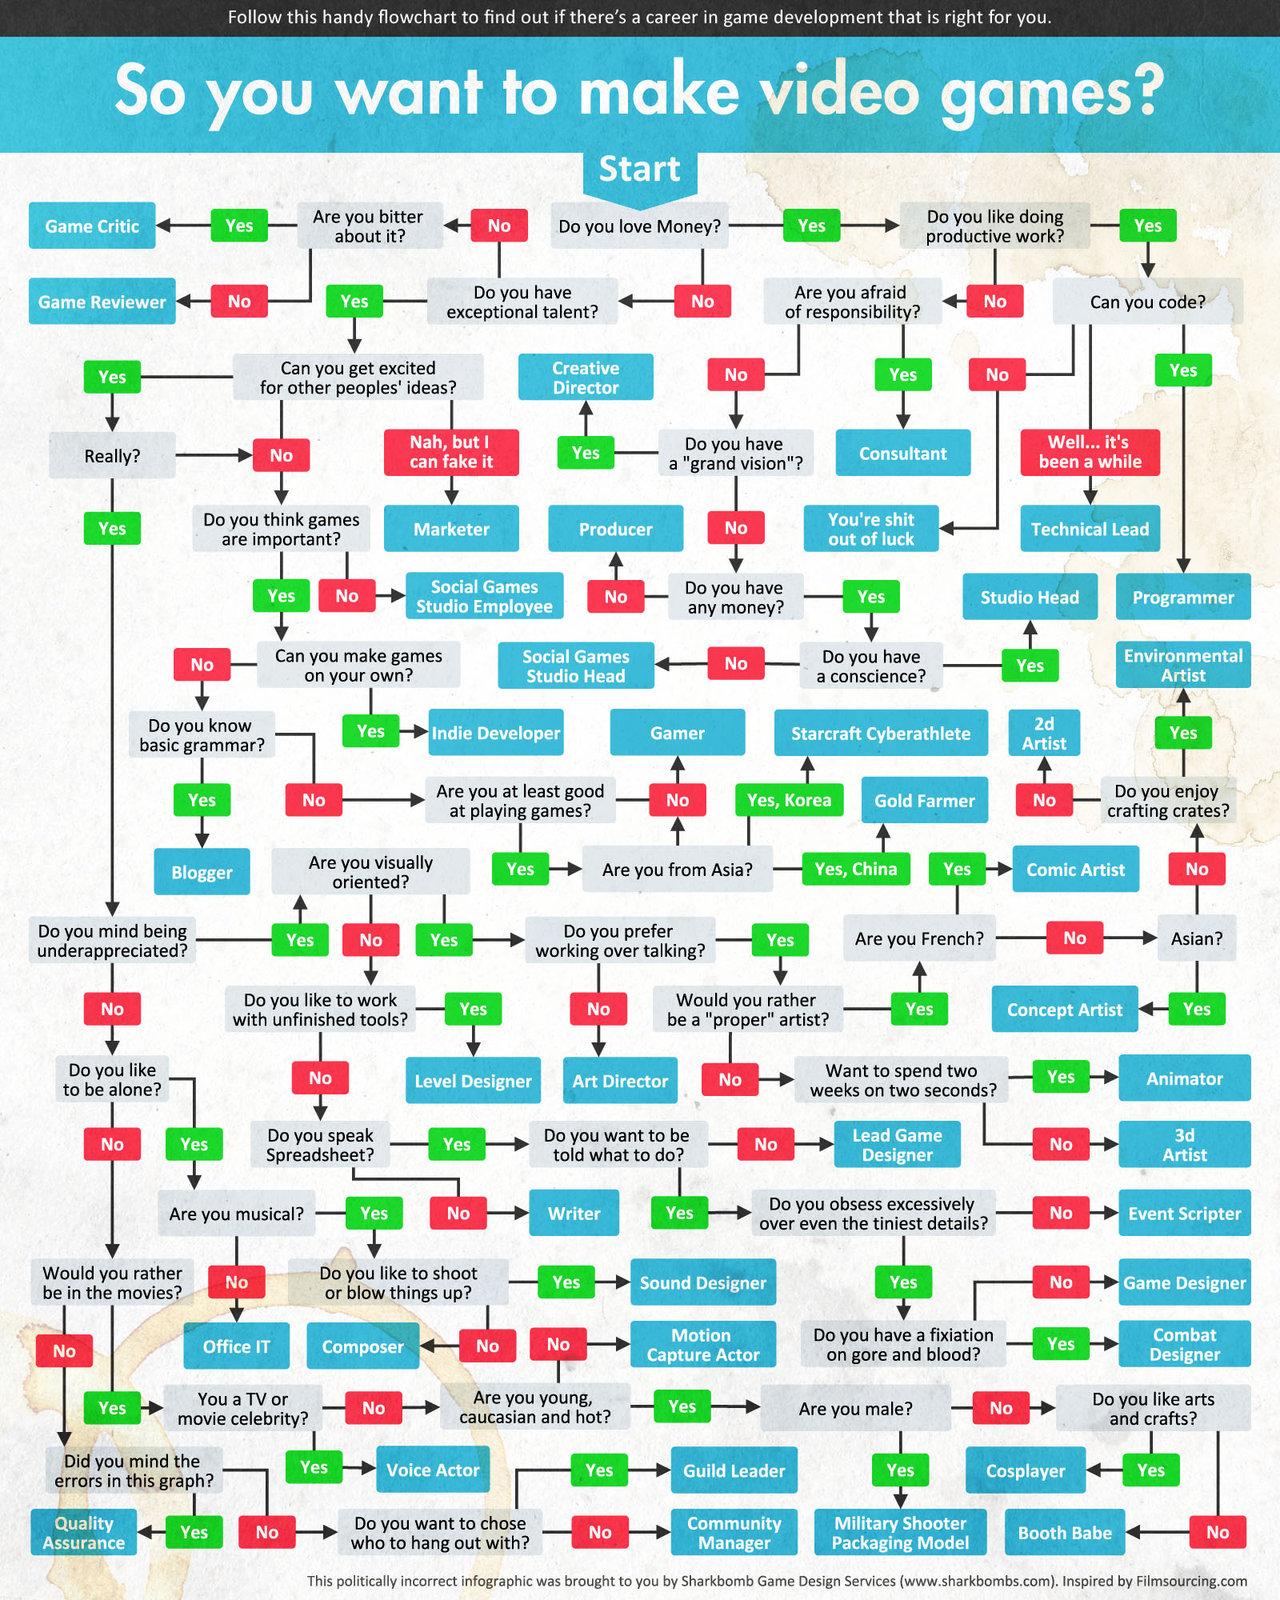 You wanna make videogames, huh? | Amazing ideas | Pinterest ...